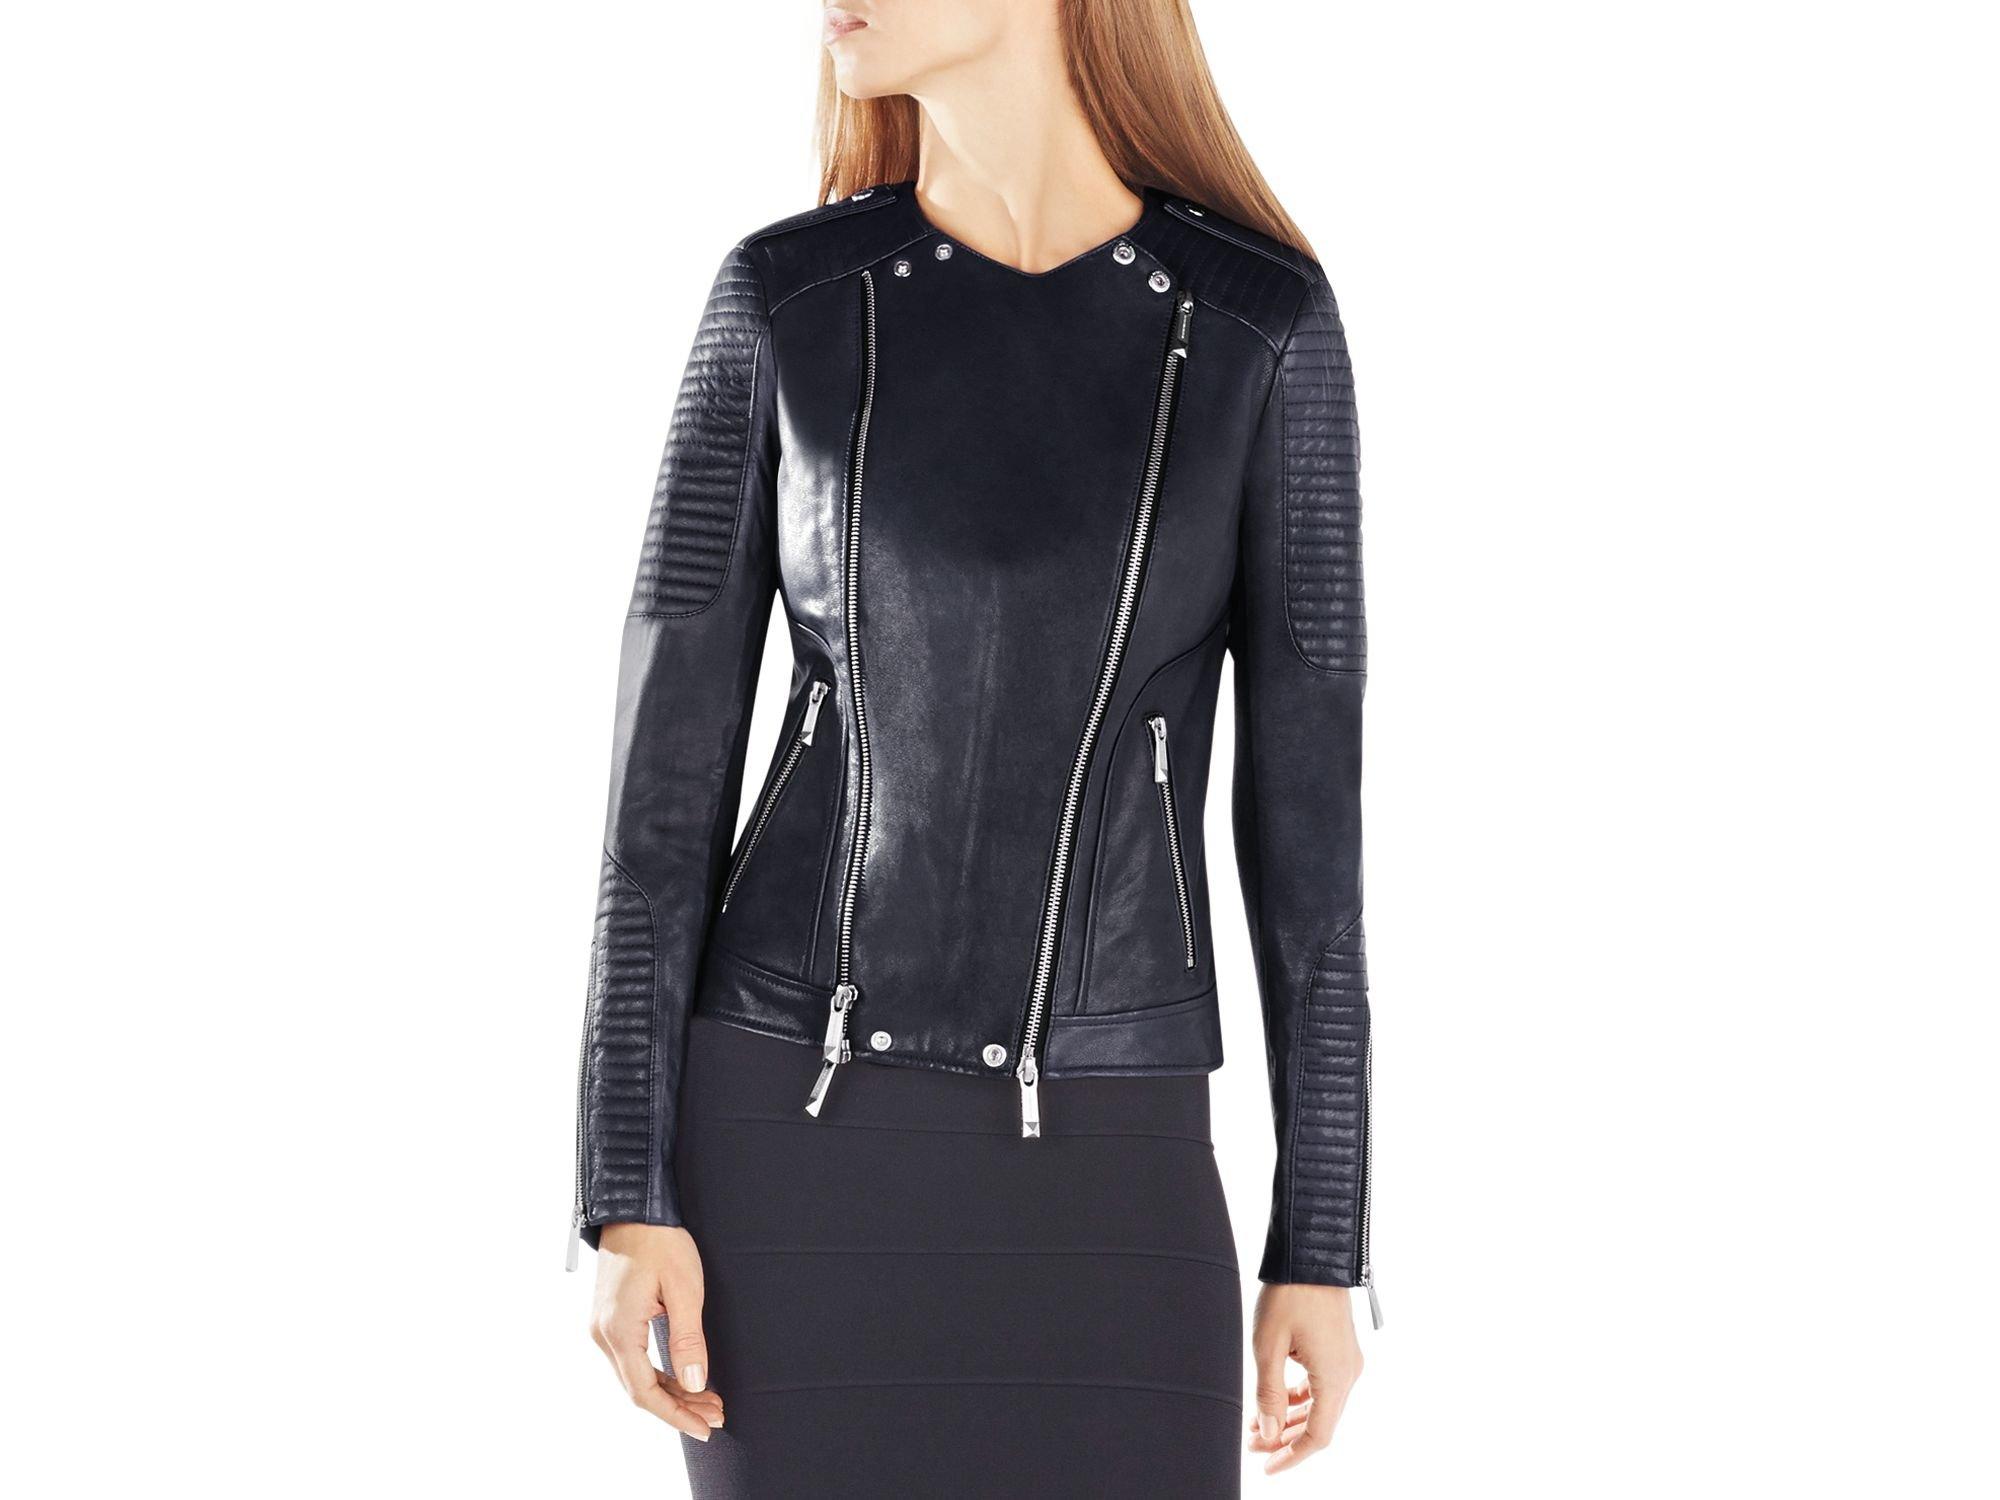 Bcbg max azria leather jacket